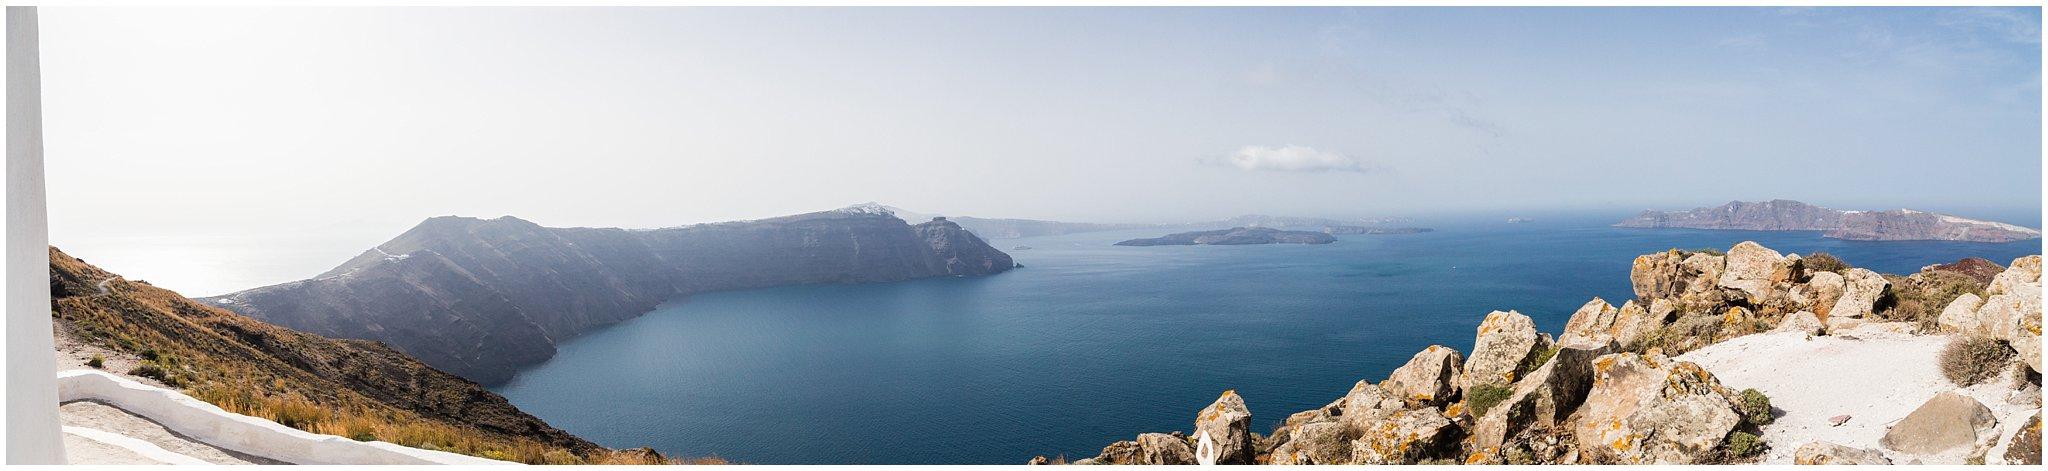 Greece_vacation_0117.jpg